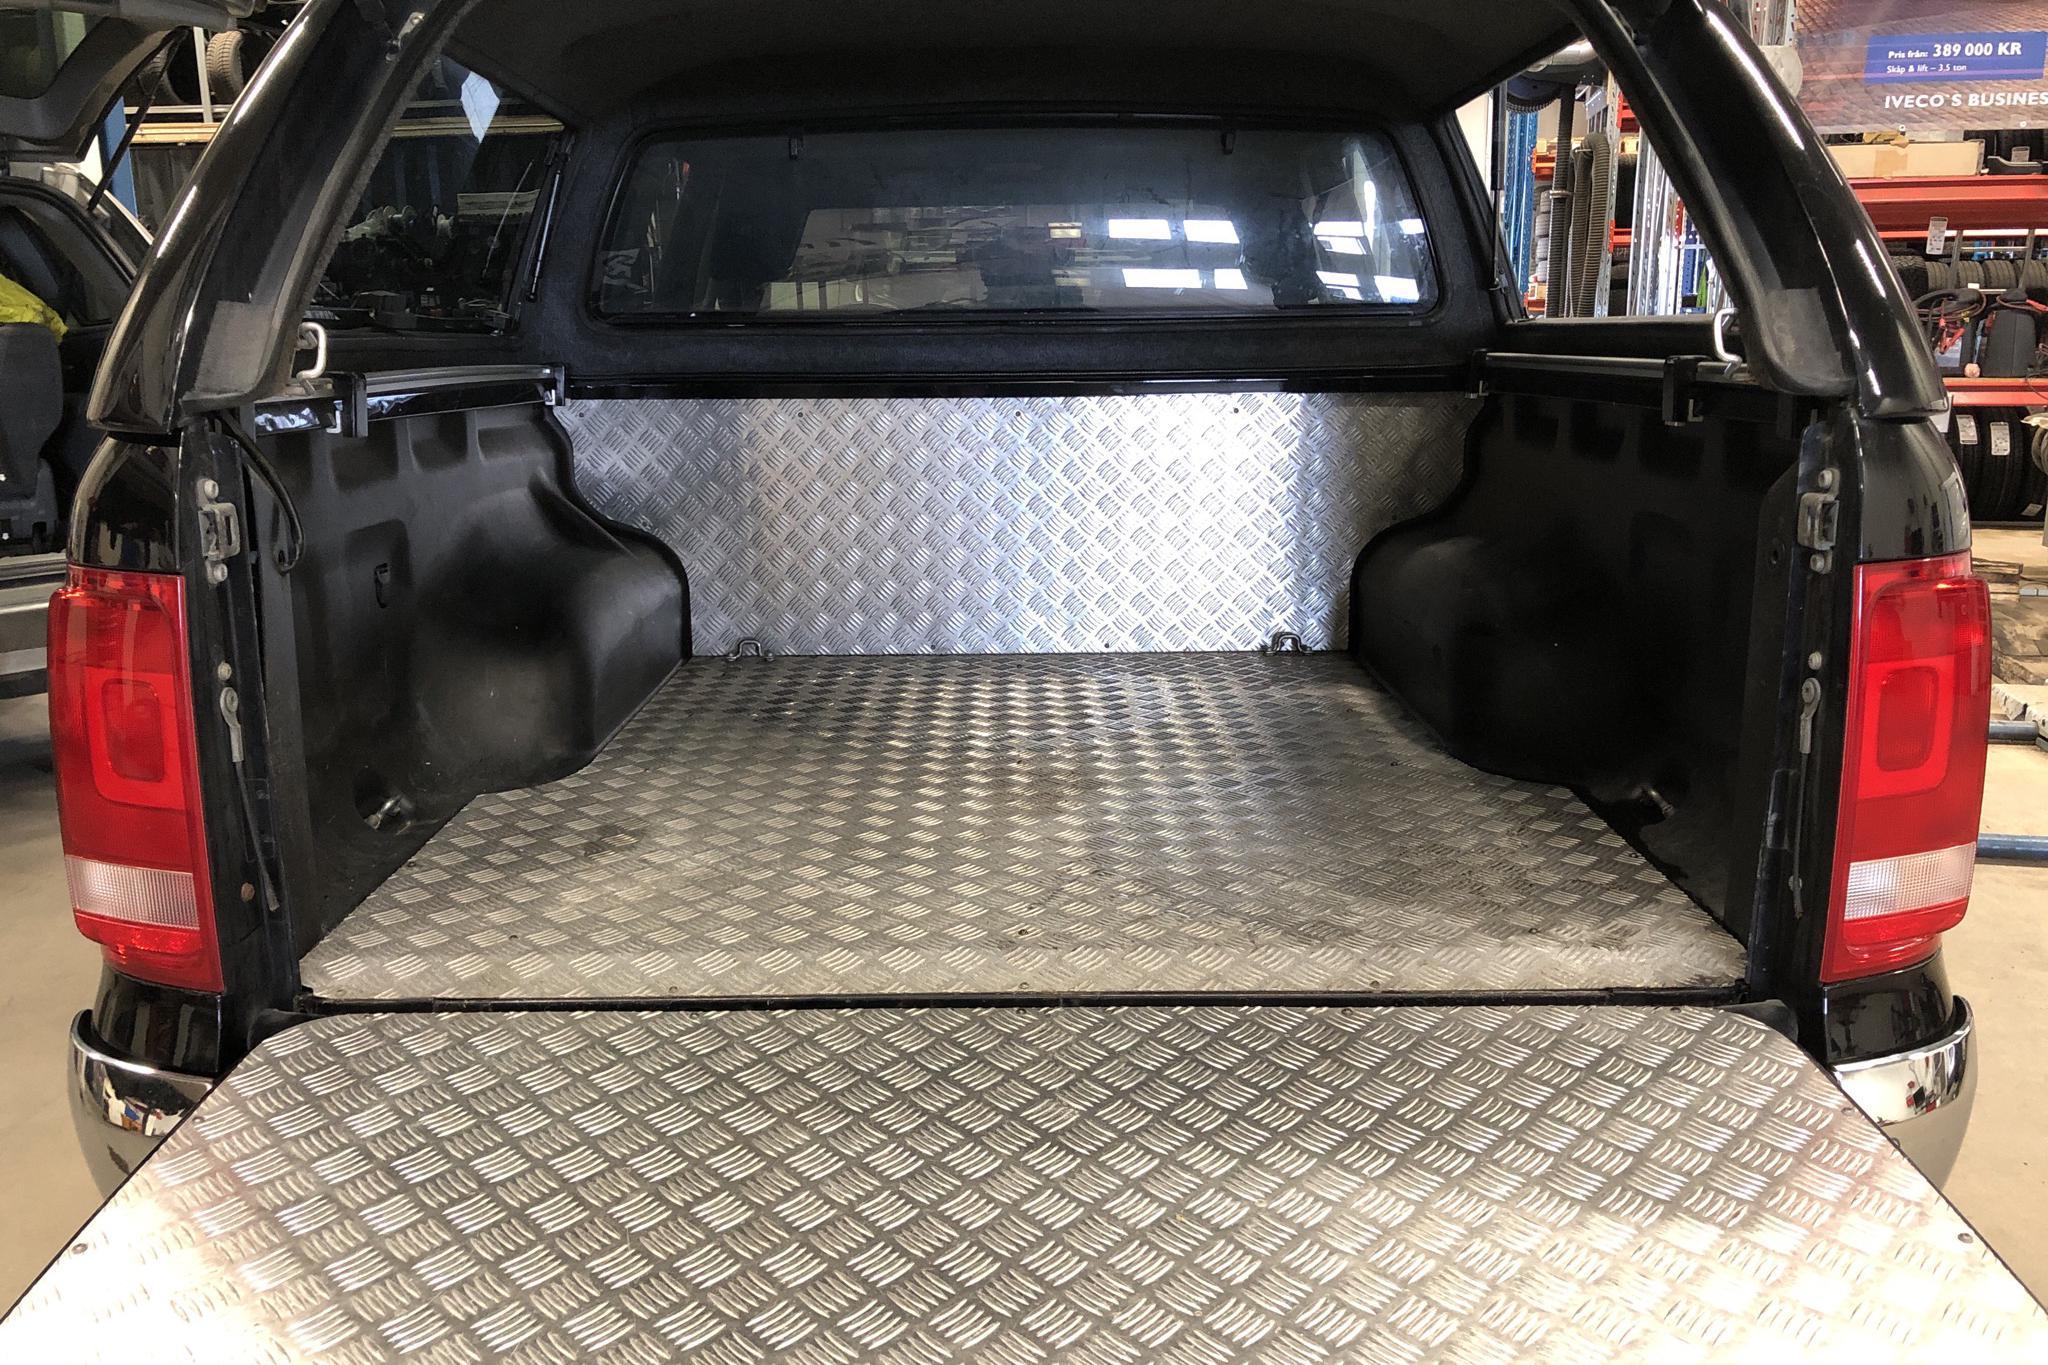 VW Amarok 2.0 TDI 4motion (180hk) - 220 880 km - Automatic - black - 2014